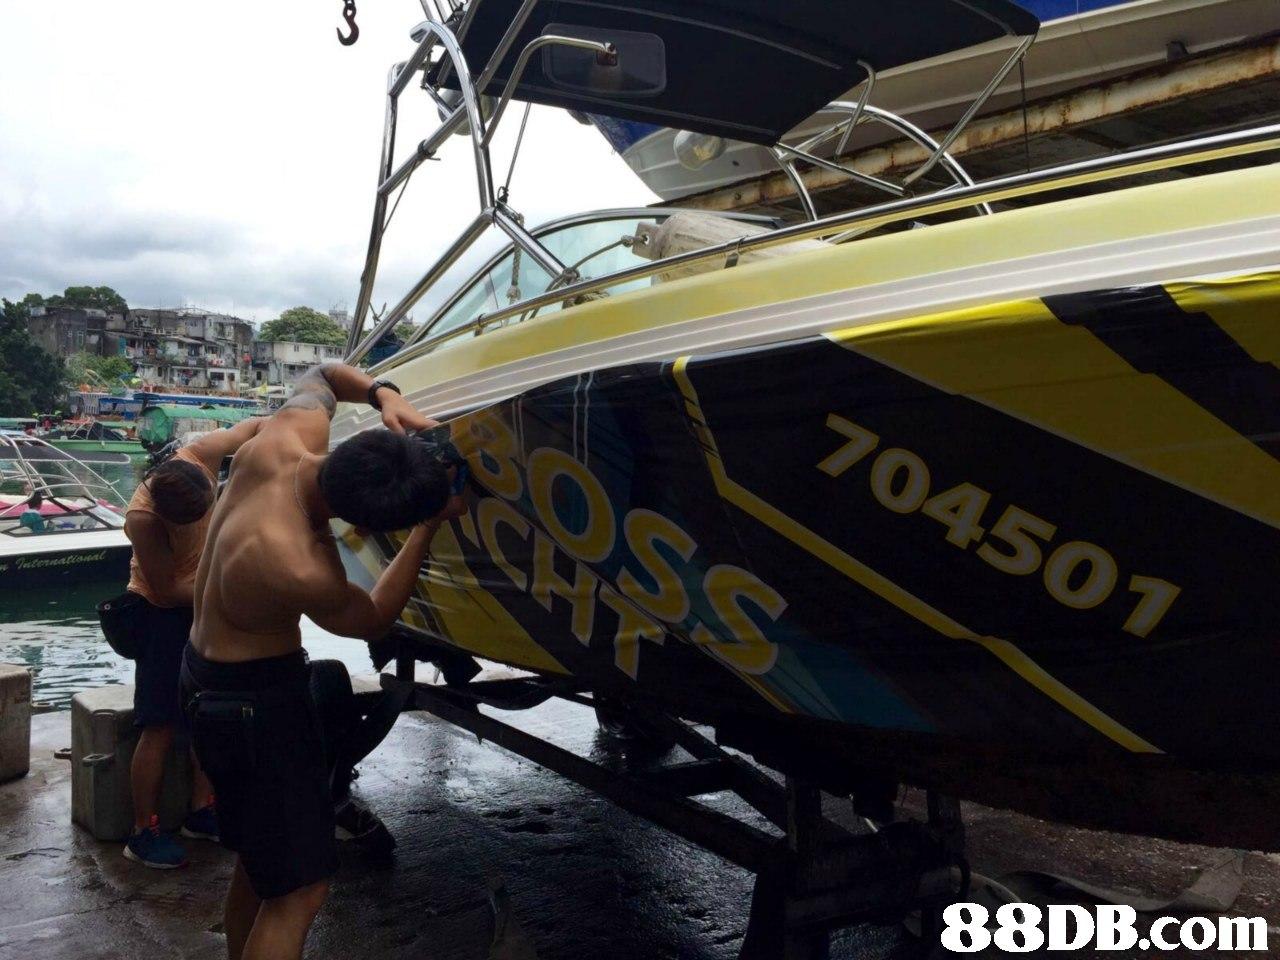 704501,boat,water transportation,motorboat,vehicle,transport